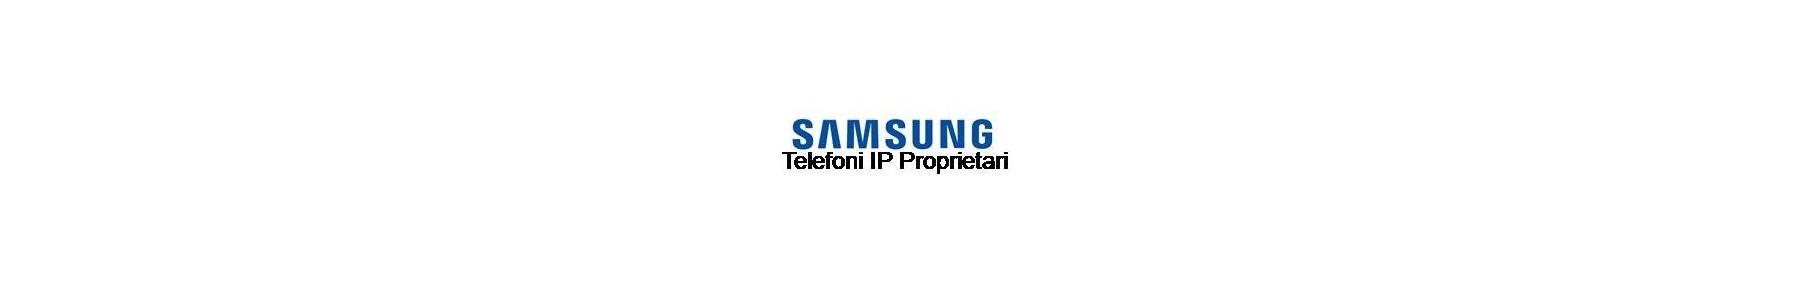 Telefoni IP Samsung